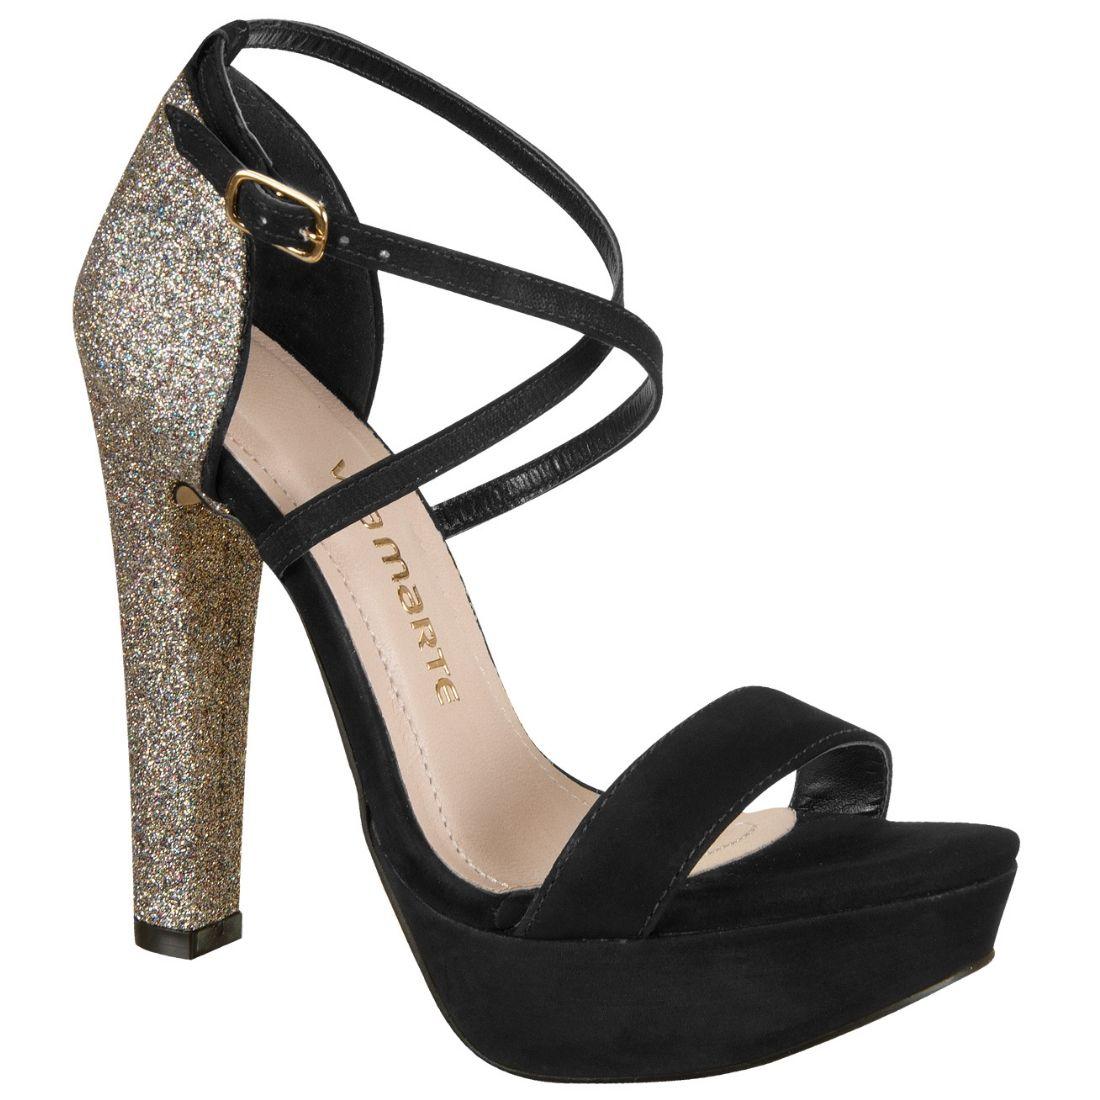 94af578b0 Sandália Via Marte 12-14907 - #Glitter #Brilho | Shoes in 2019 ...